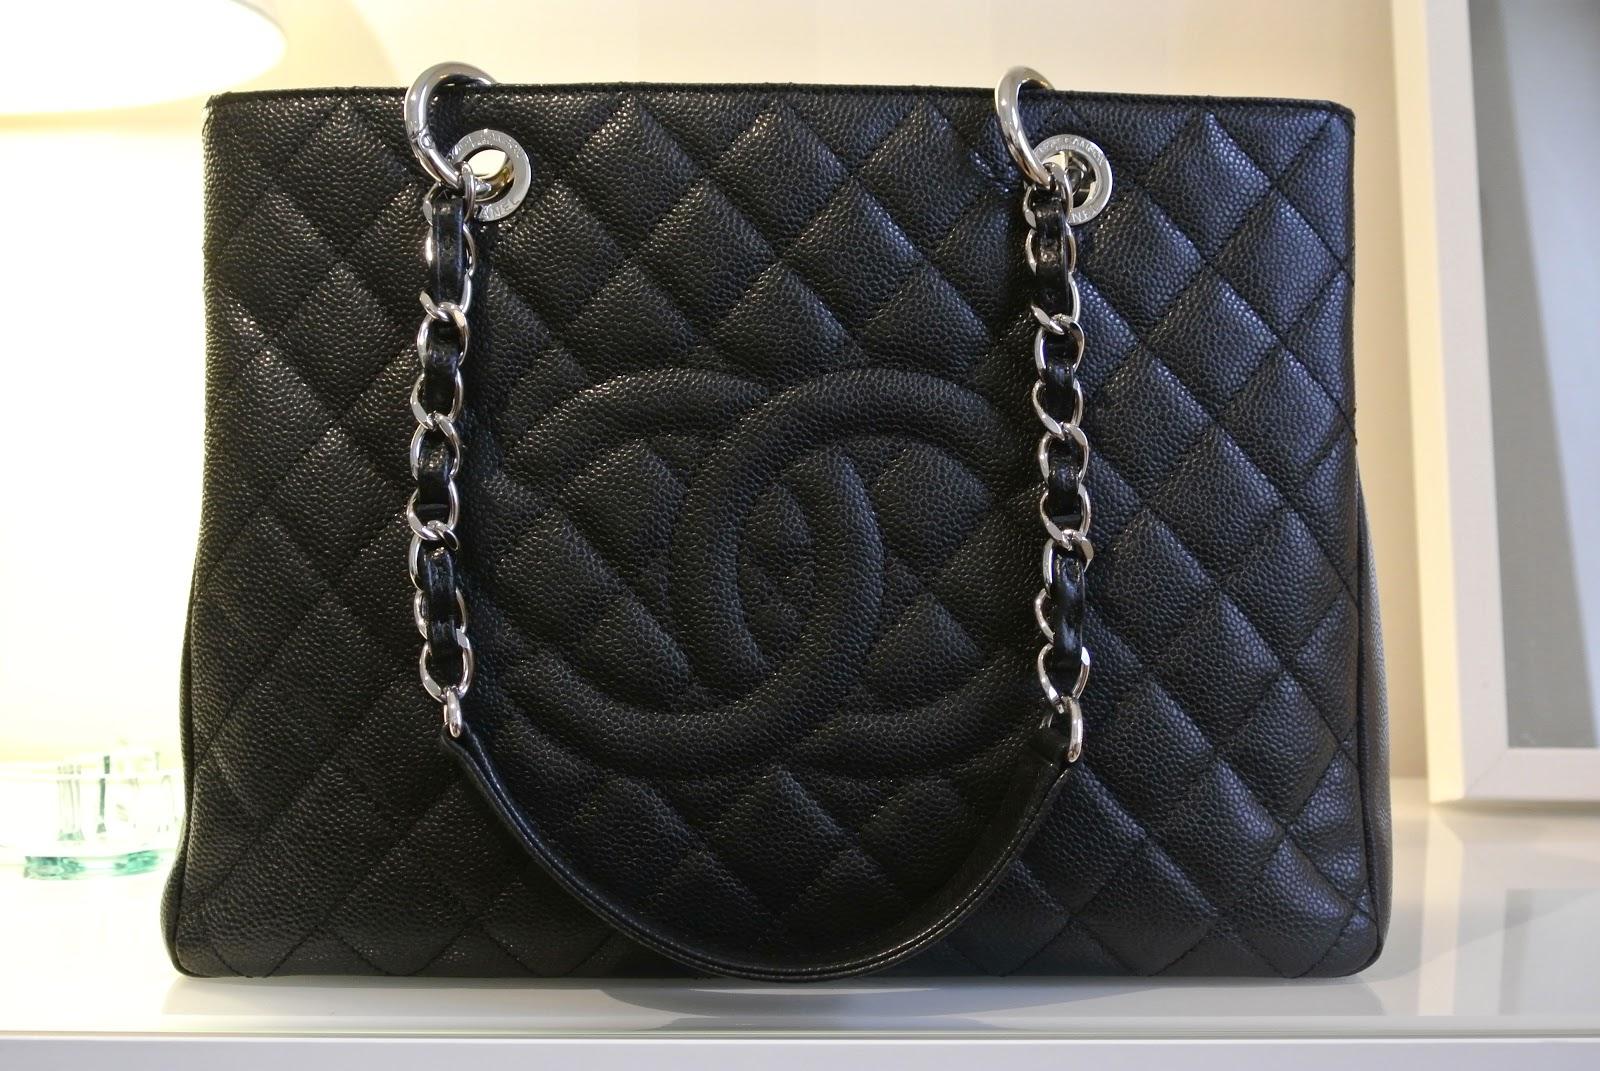 My bags - Xenia s day 85b6a5cf8e